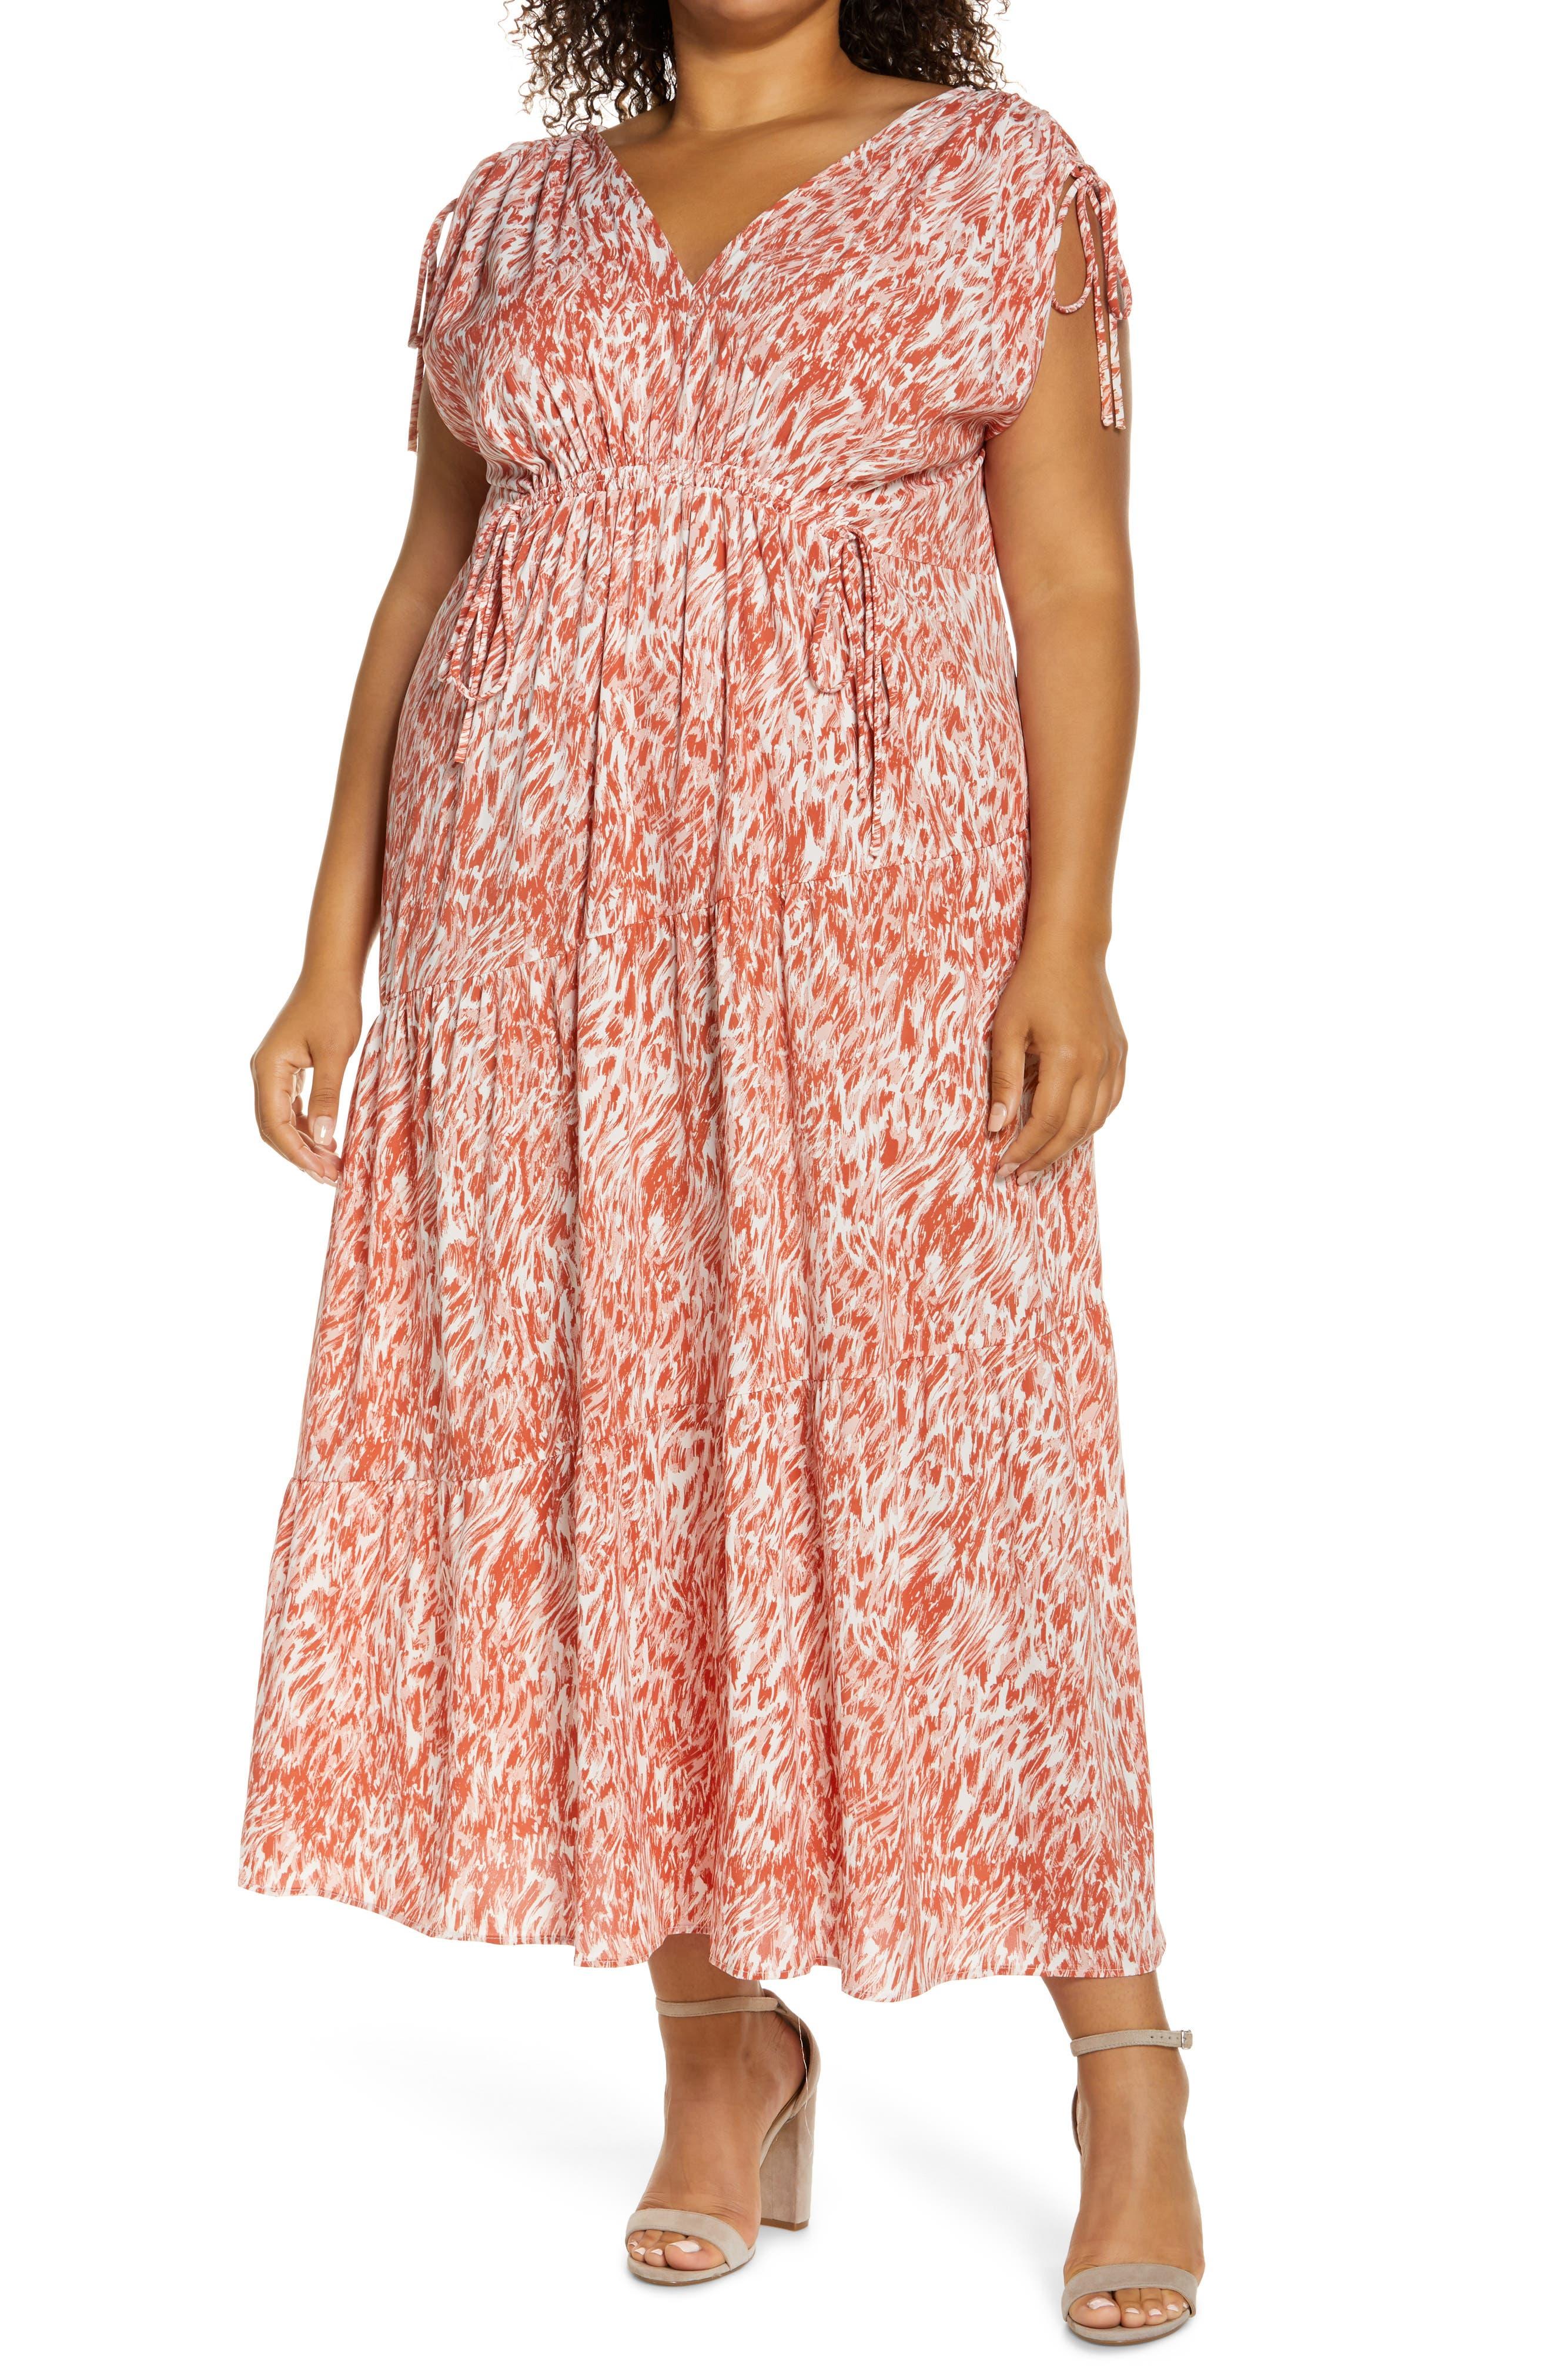 Abstract Swirl Print Tie Sleeve Maxi Dress